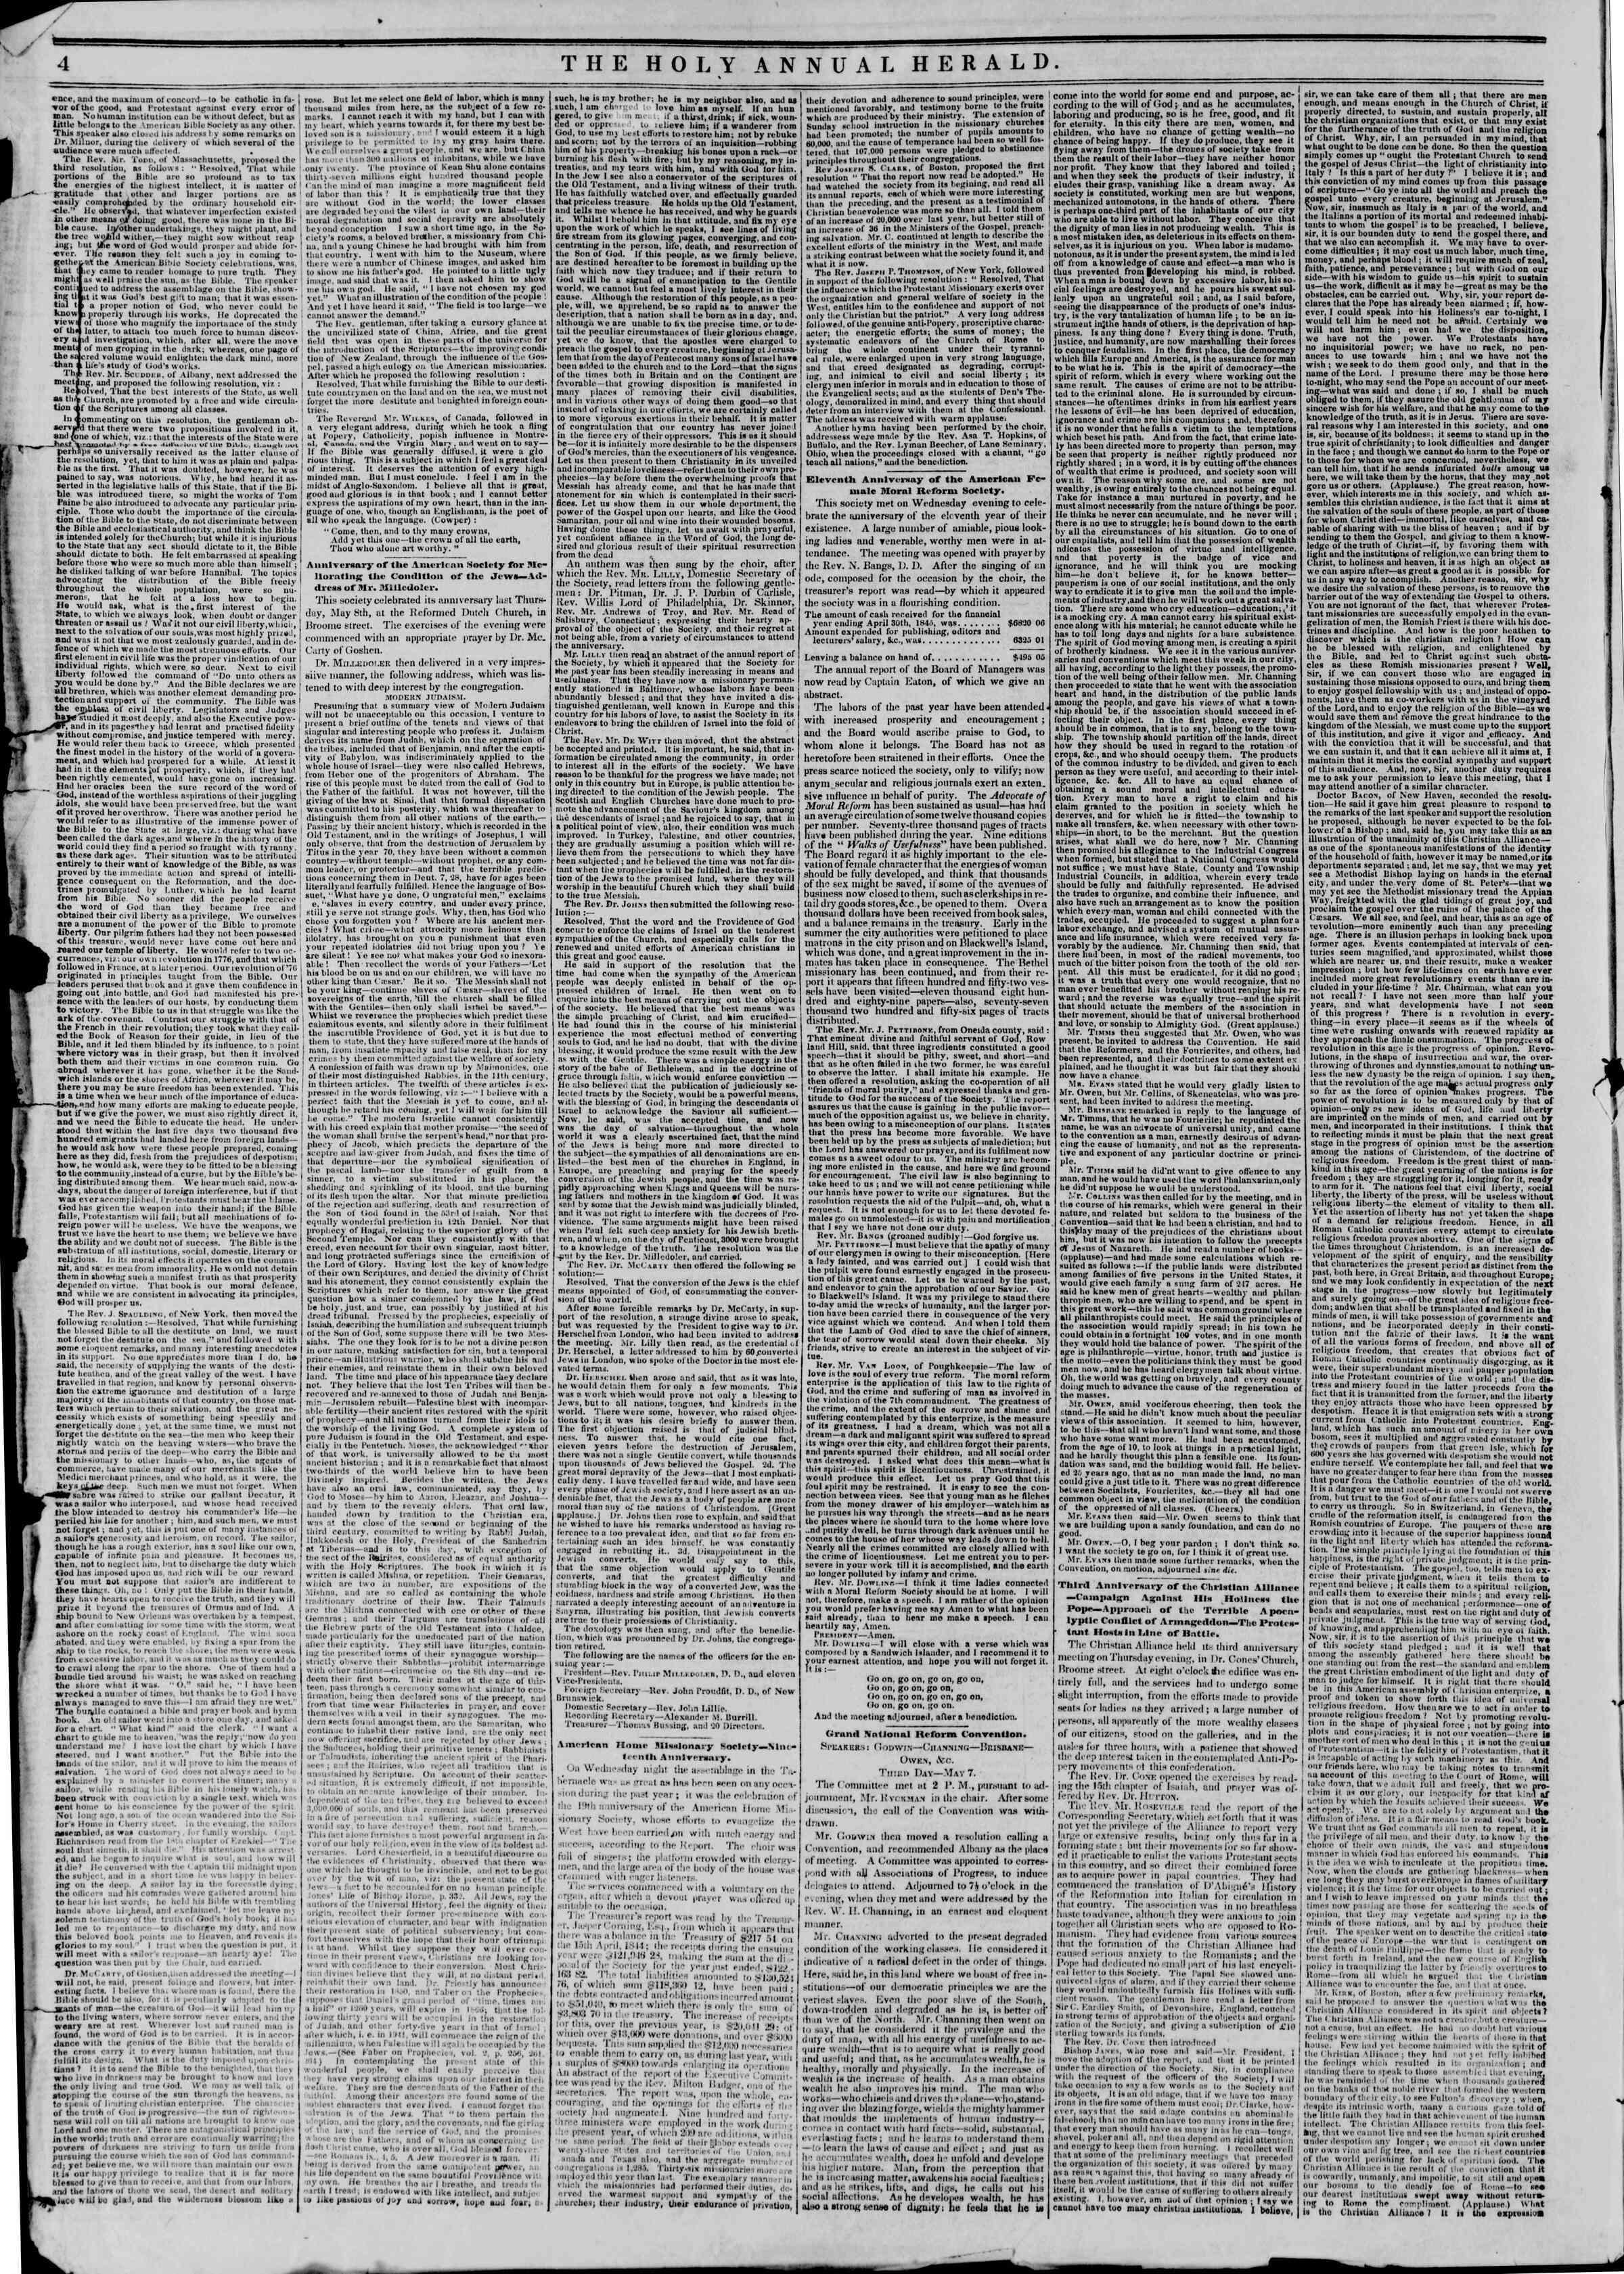 May 10, 1845 Tarihli The New York Herald Gazetesi Sayfa 8